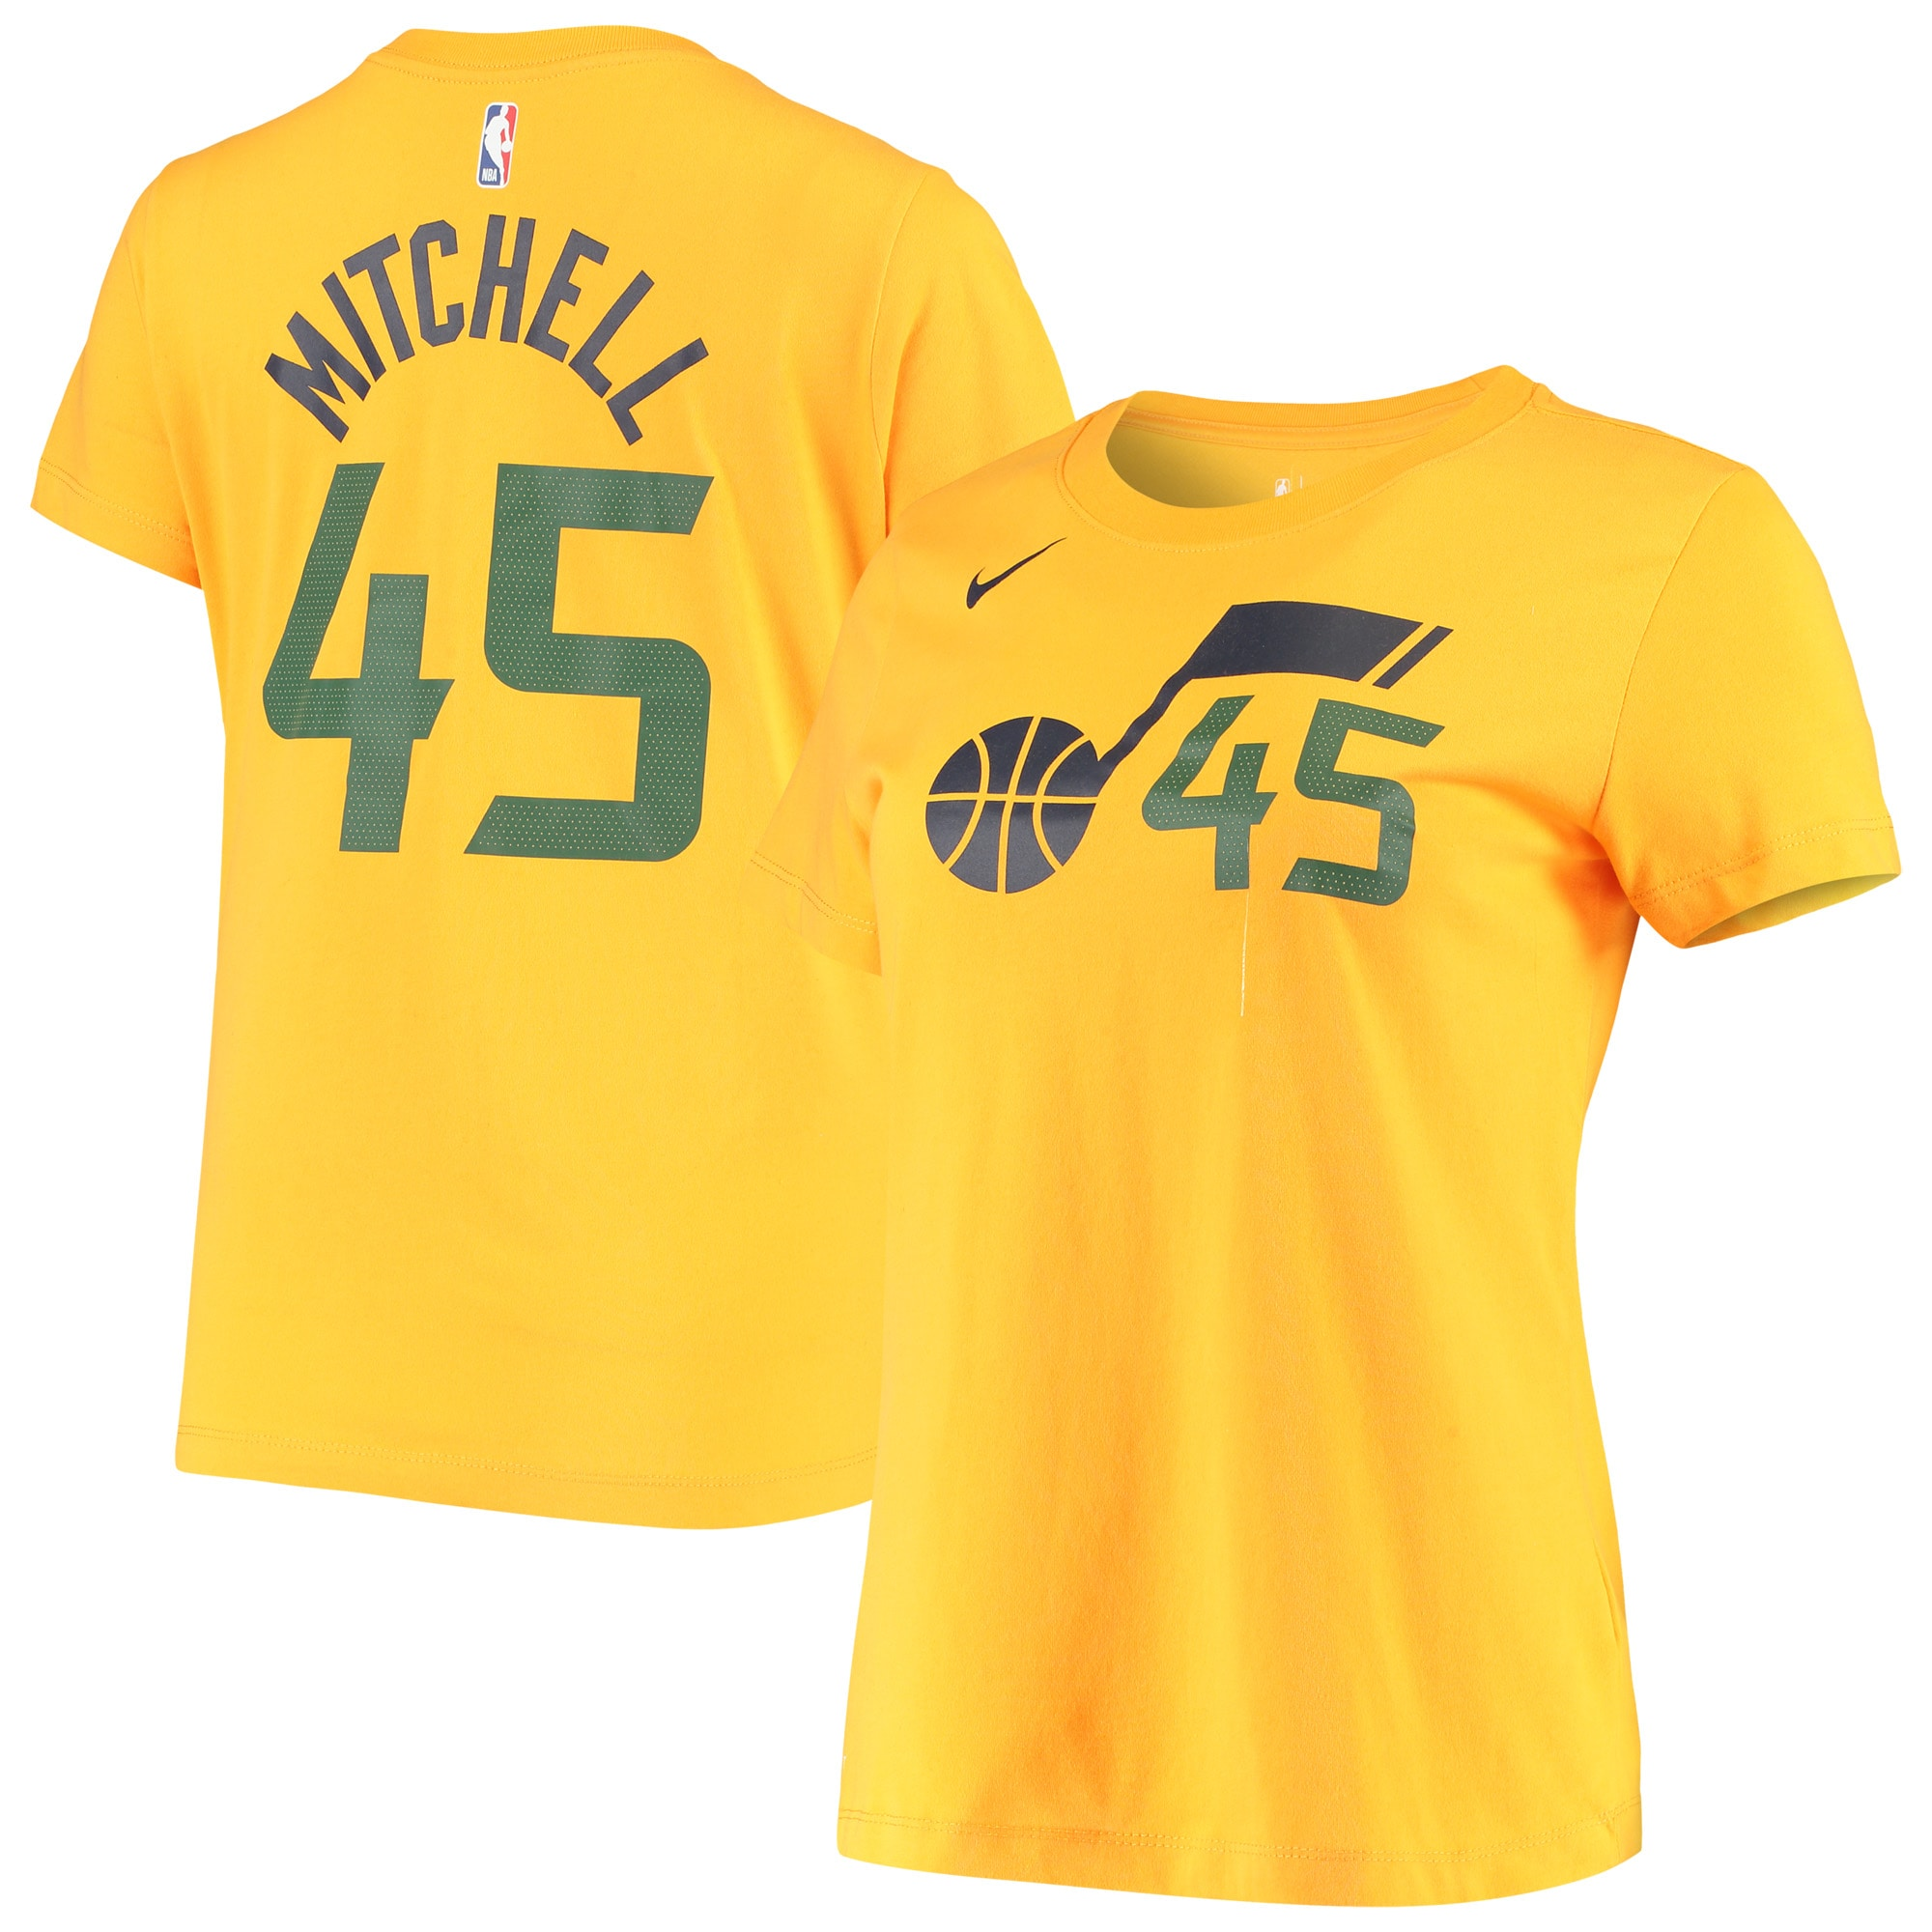 Donovan Mitchell Utah Jazz Nike Women's 2019/20 City Edition Name & Number Team Performance T-Shirt - Gold